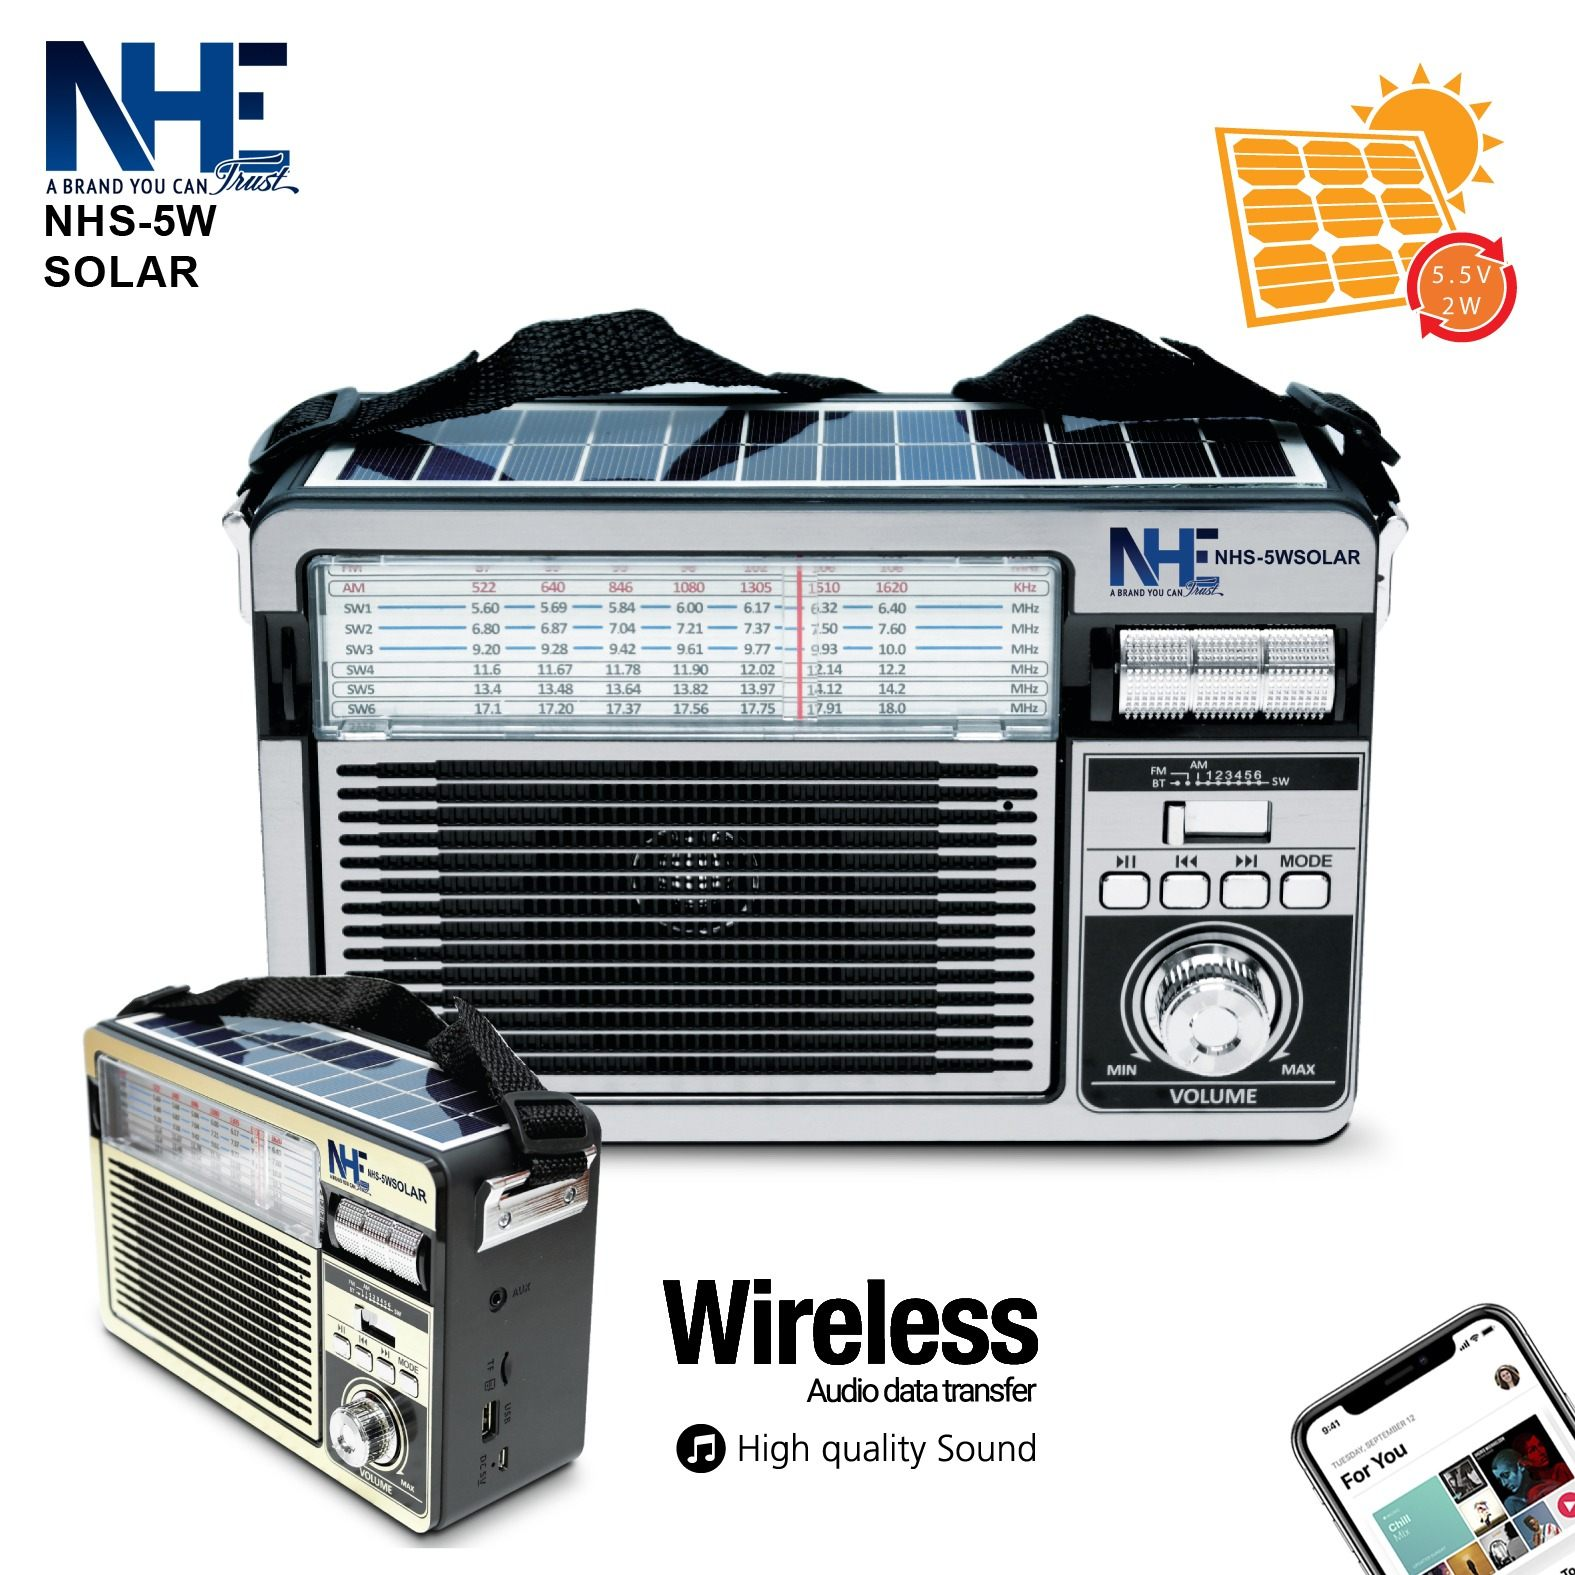 NHE Solar Speaker - NHS-5W